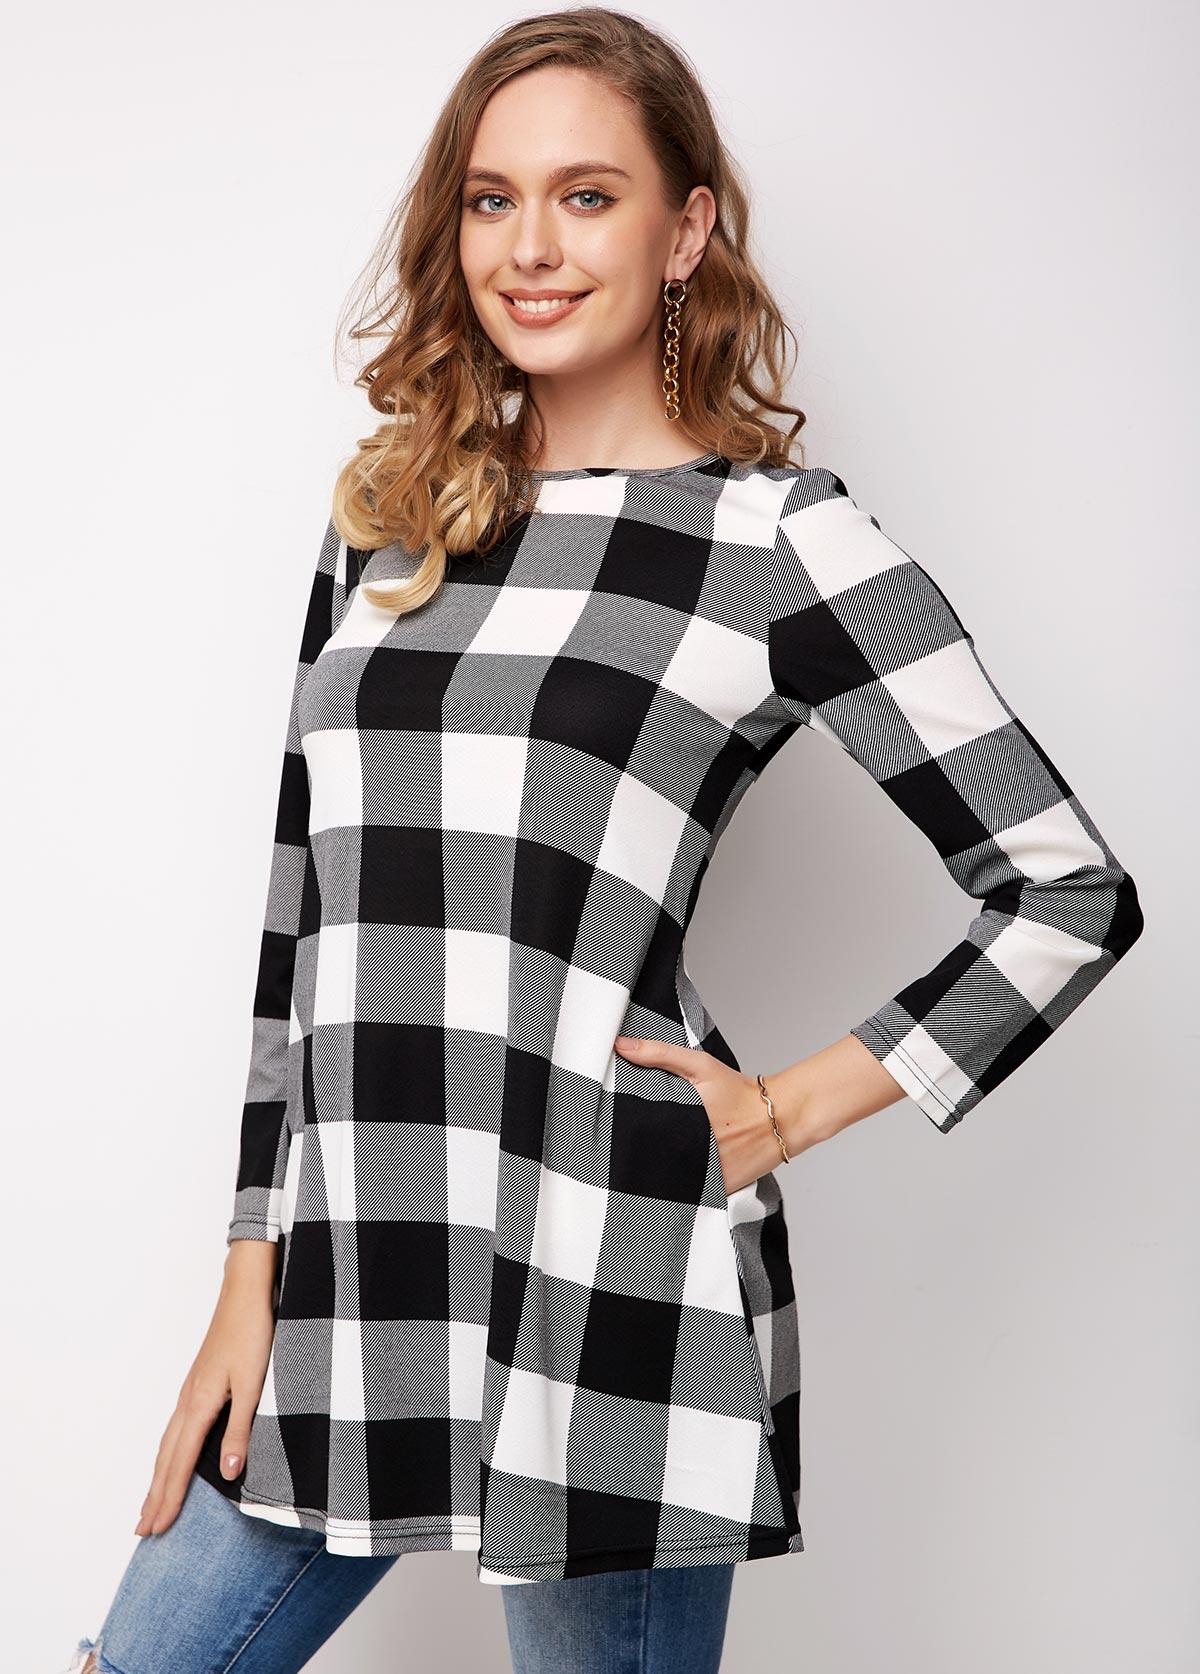 Plaid Long Sleeve Round Neck Pocket T Shirt